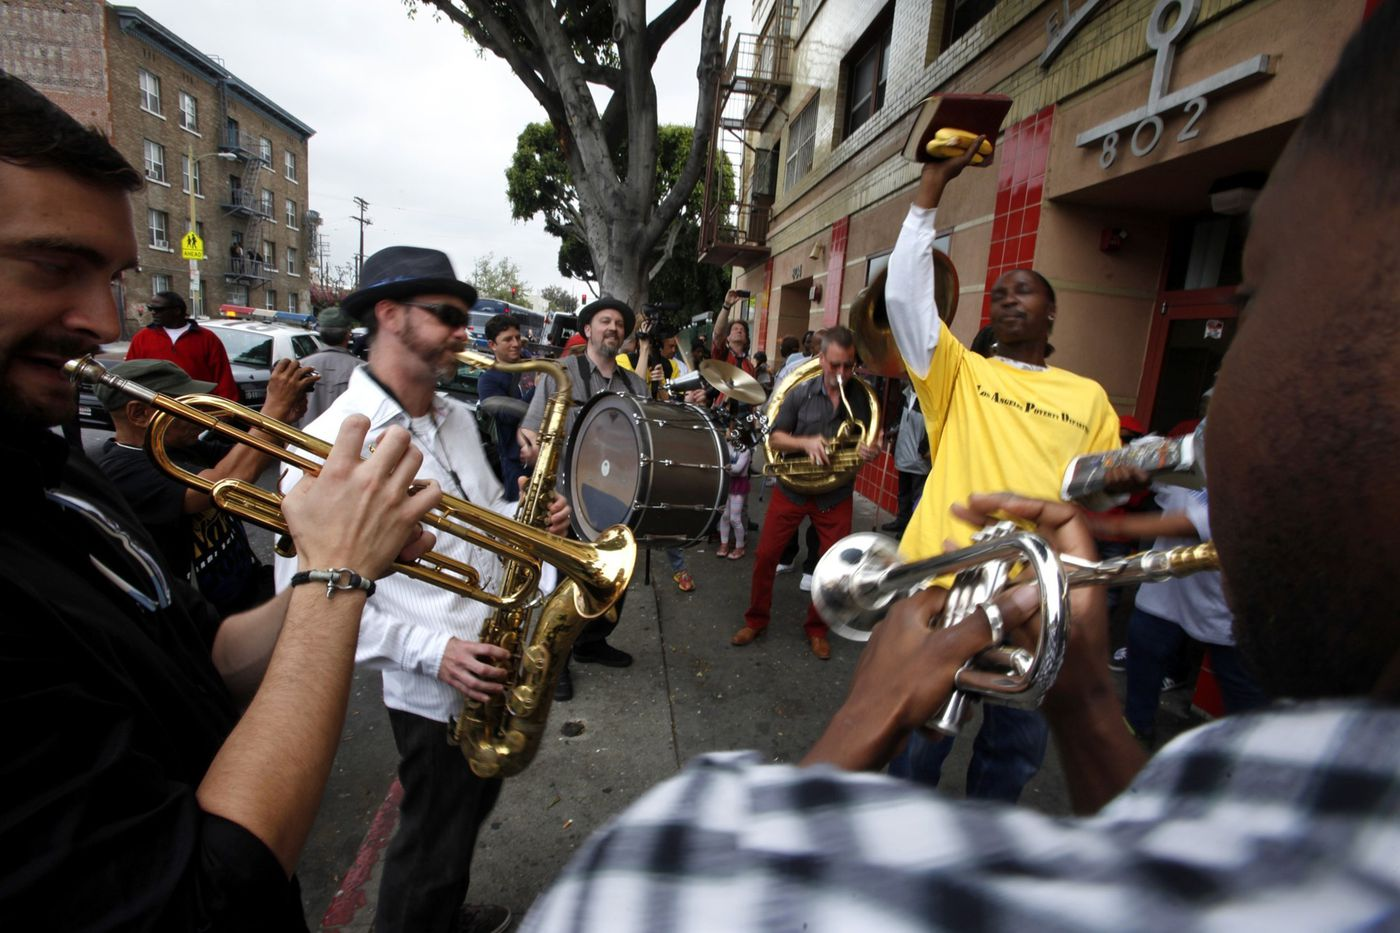 Photo by Genaro Molina / LA Times